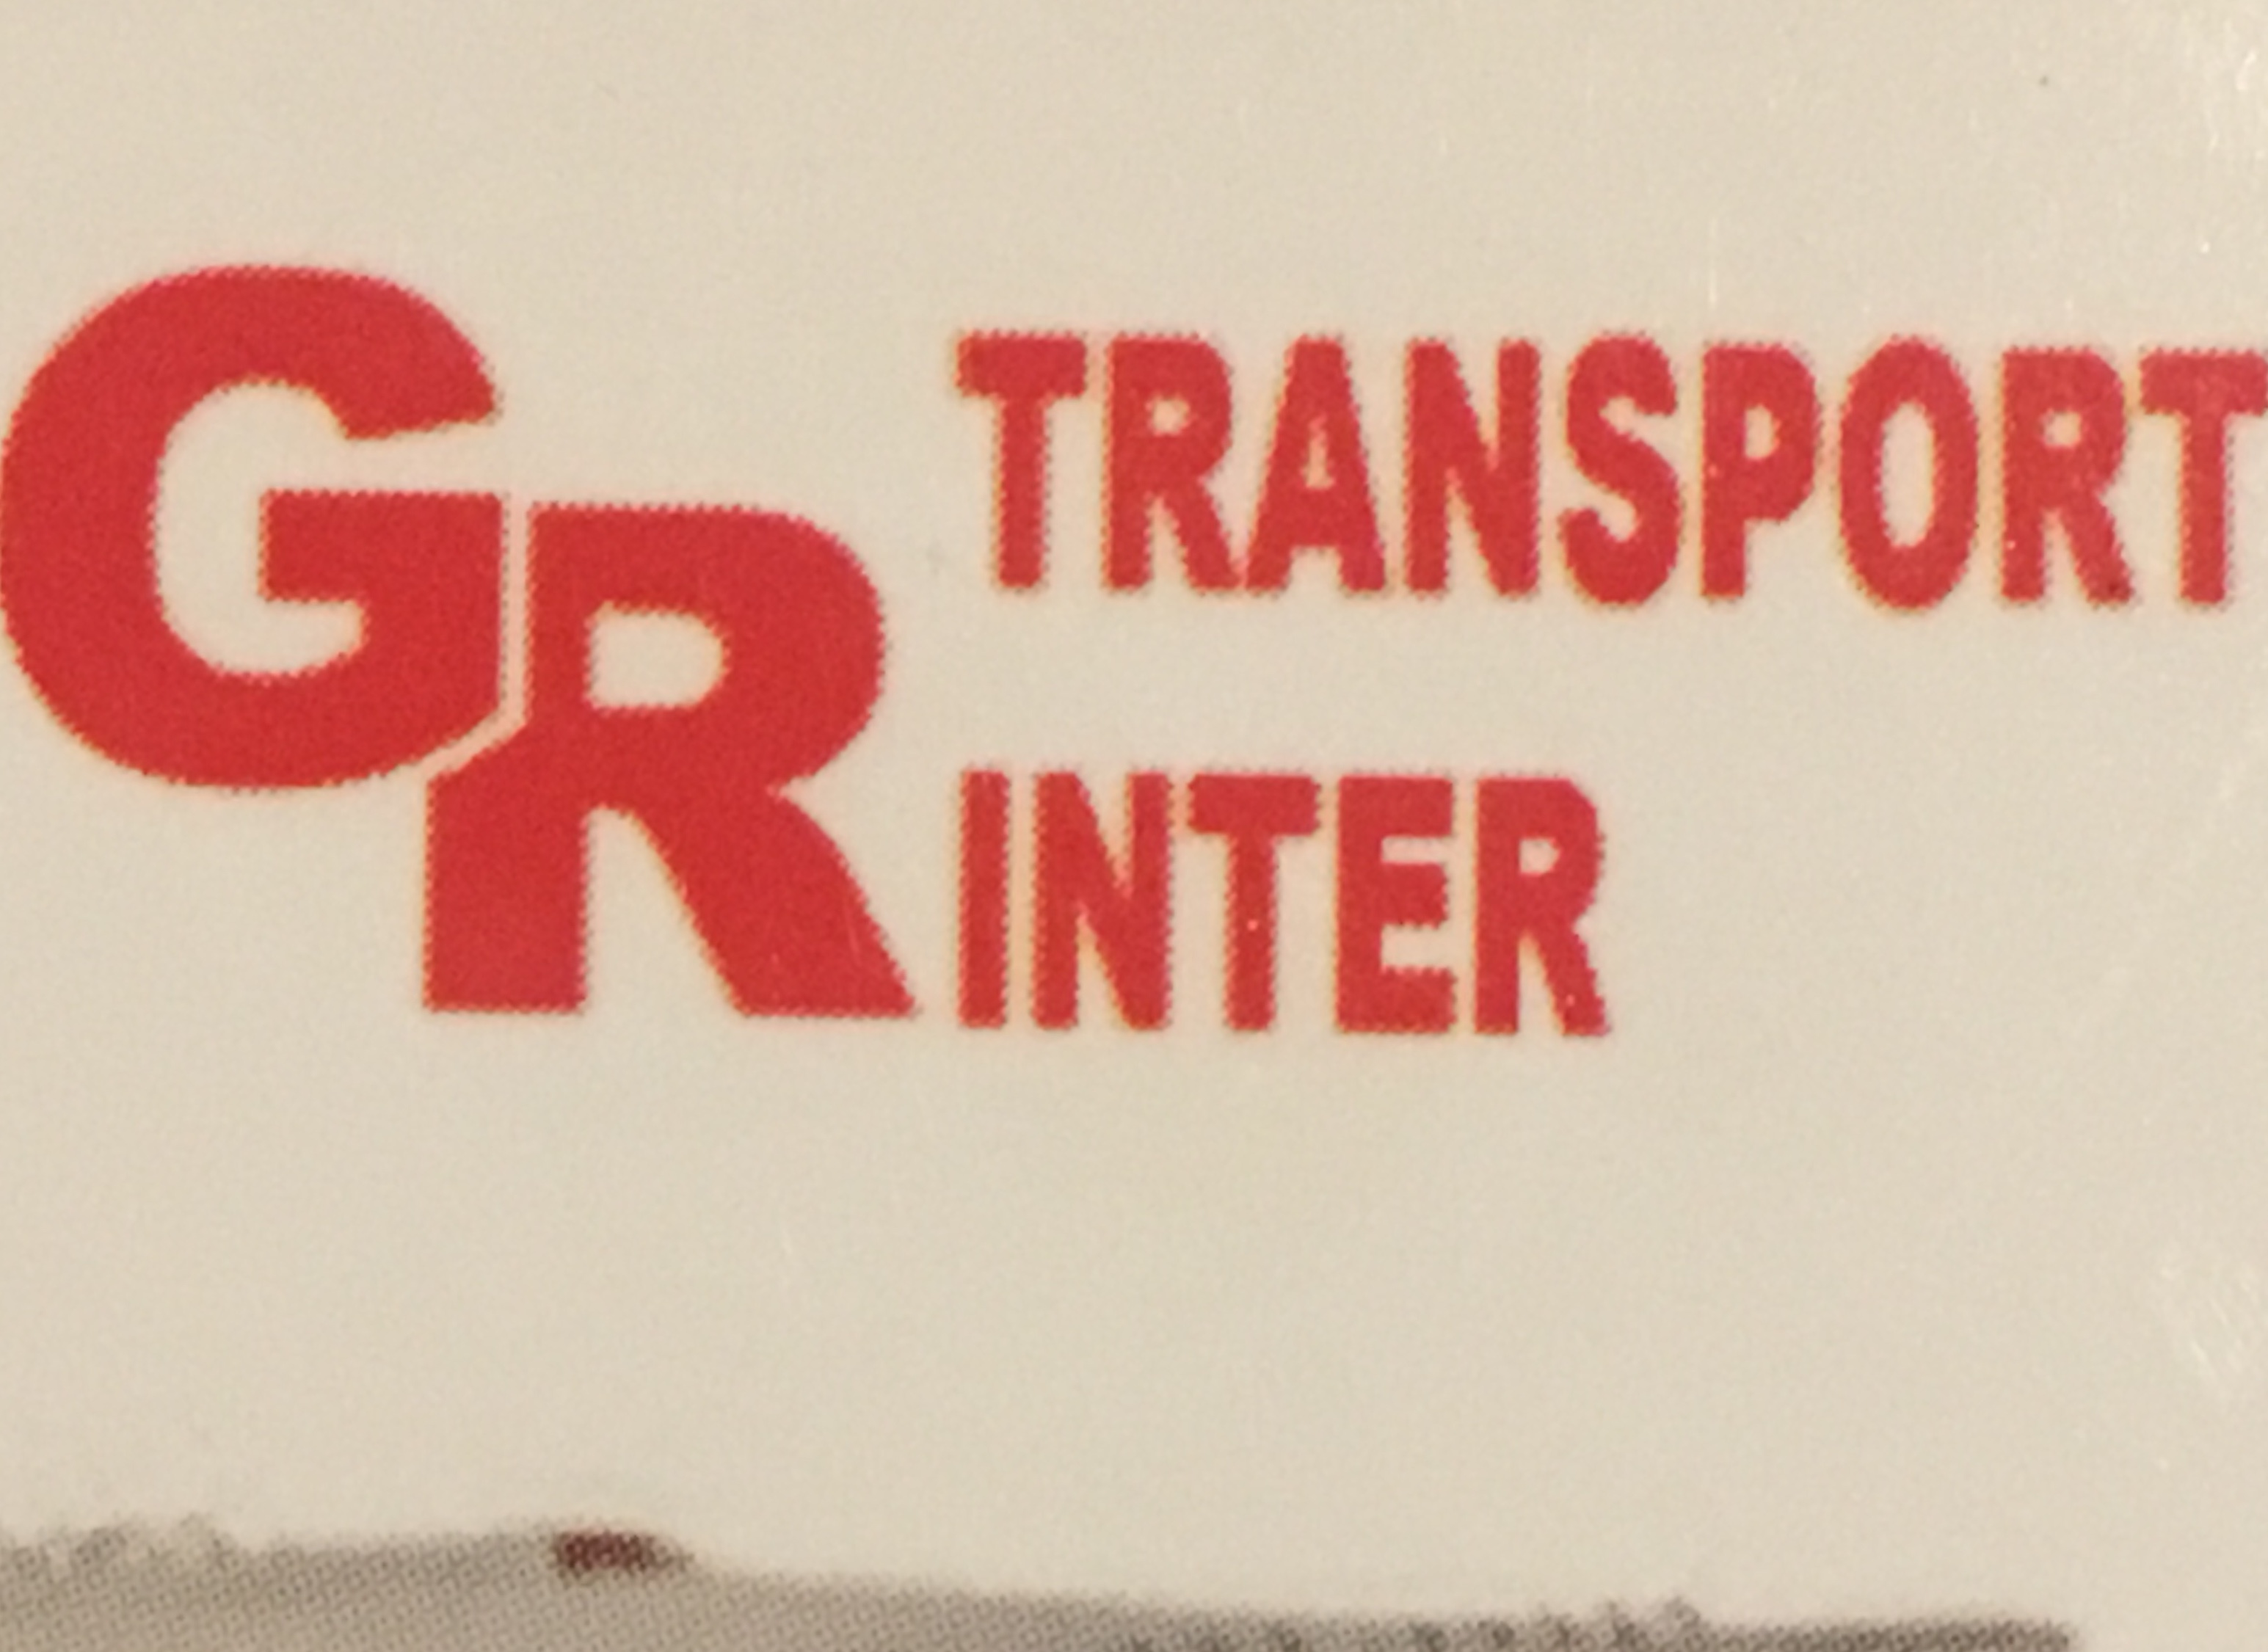 G.r. Transport Inter